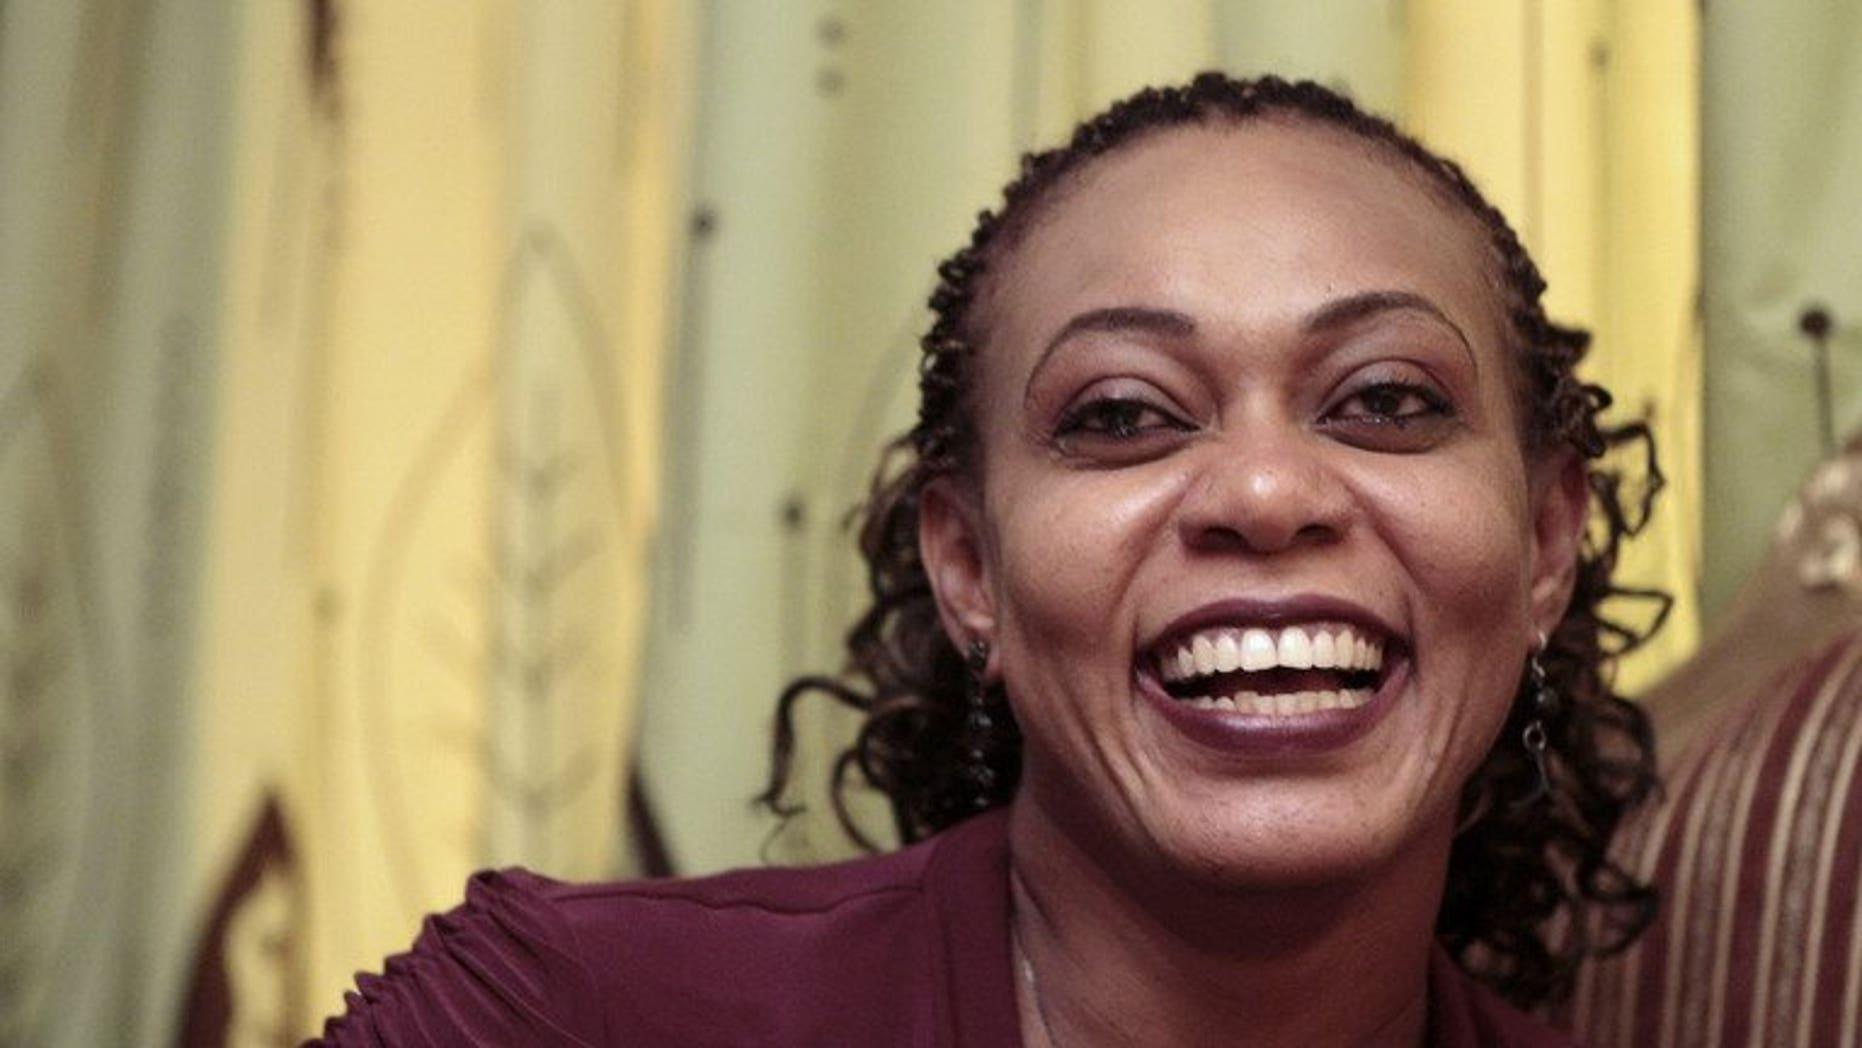 Sudanese Amira Osman Hamed speaks with an AFP journalist during an interview in Khartoum on September 8, 2013.